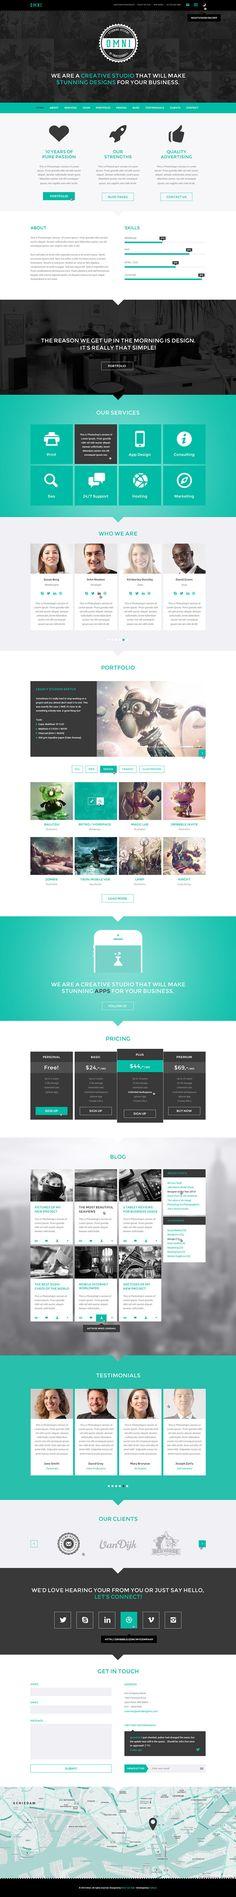 Omni - Responsive One / Multi Page HTML5 Parallax by ibrahim ekinci, via @Behance